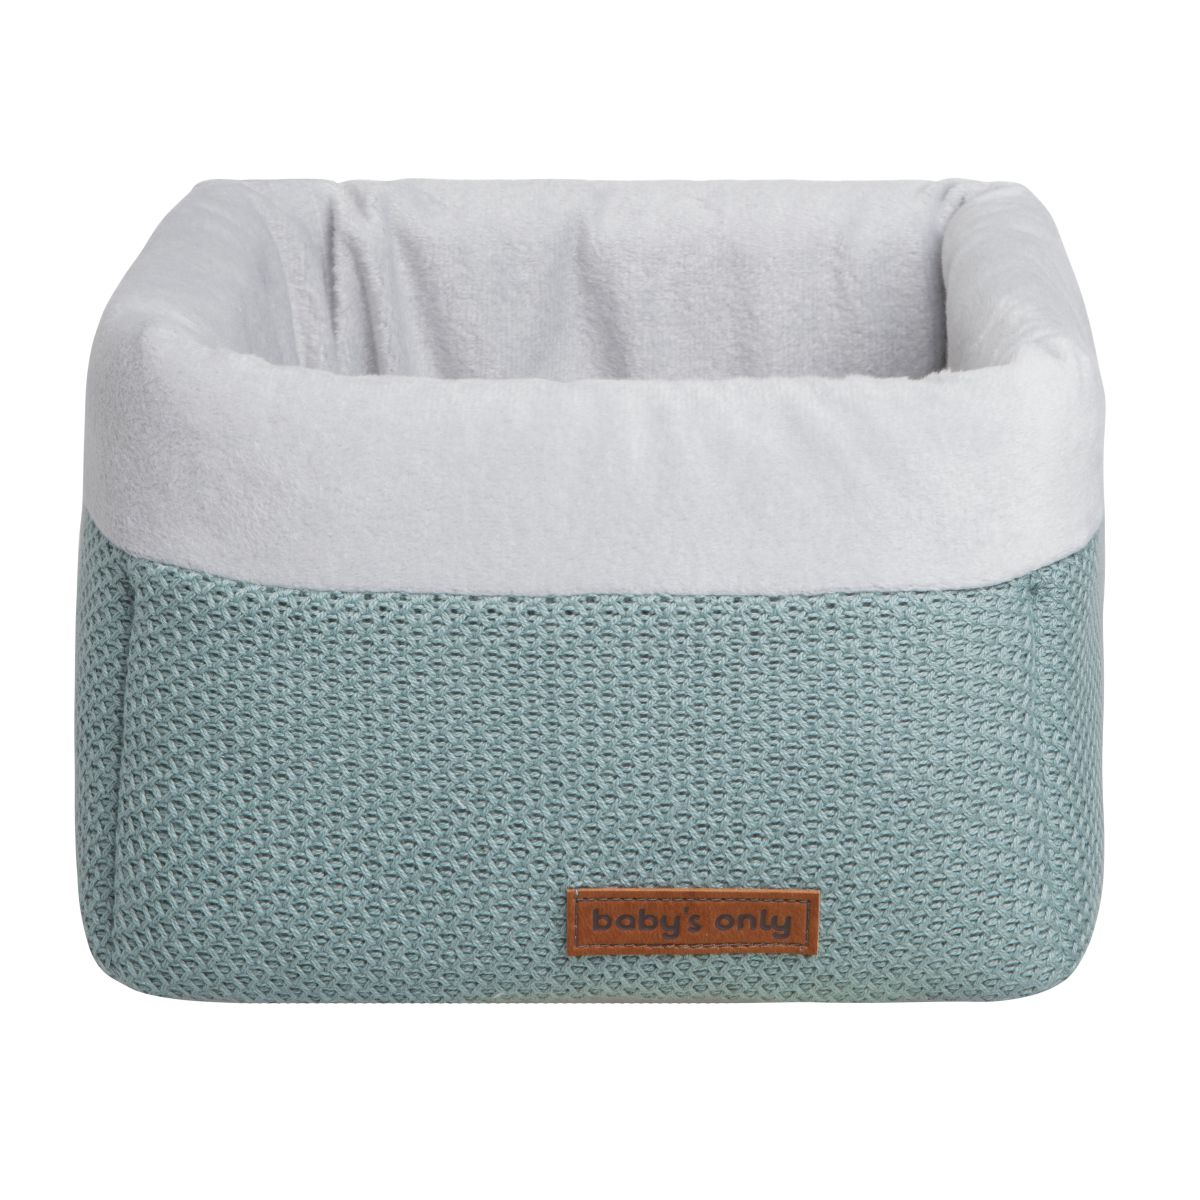 babys only 0203910 commodemandje classic stonegreen